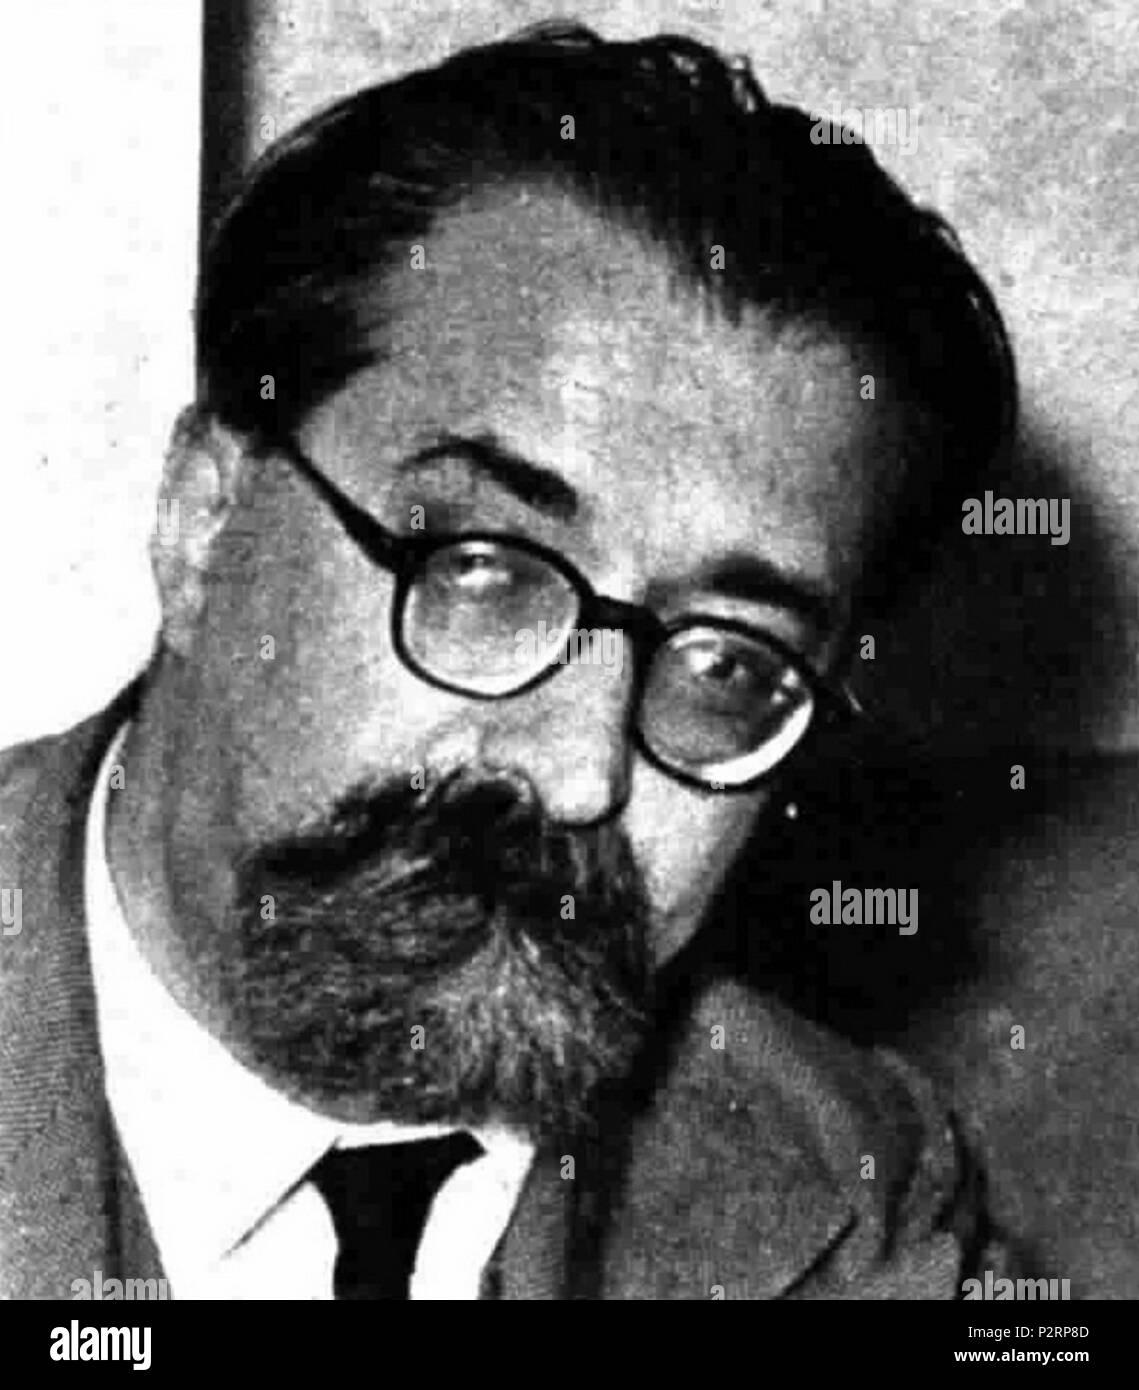 Giordani Stock Photos Images Alamy Original White Italian Chemist Francesco 21 February 1954 Unknown 30